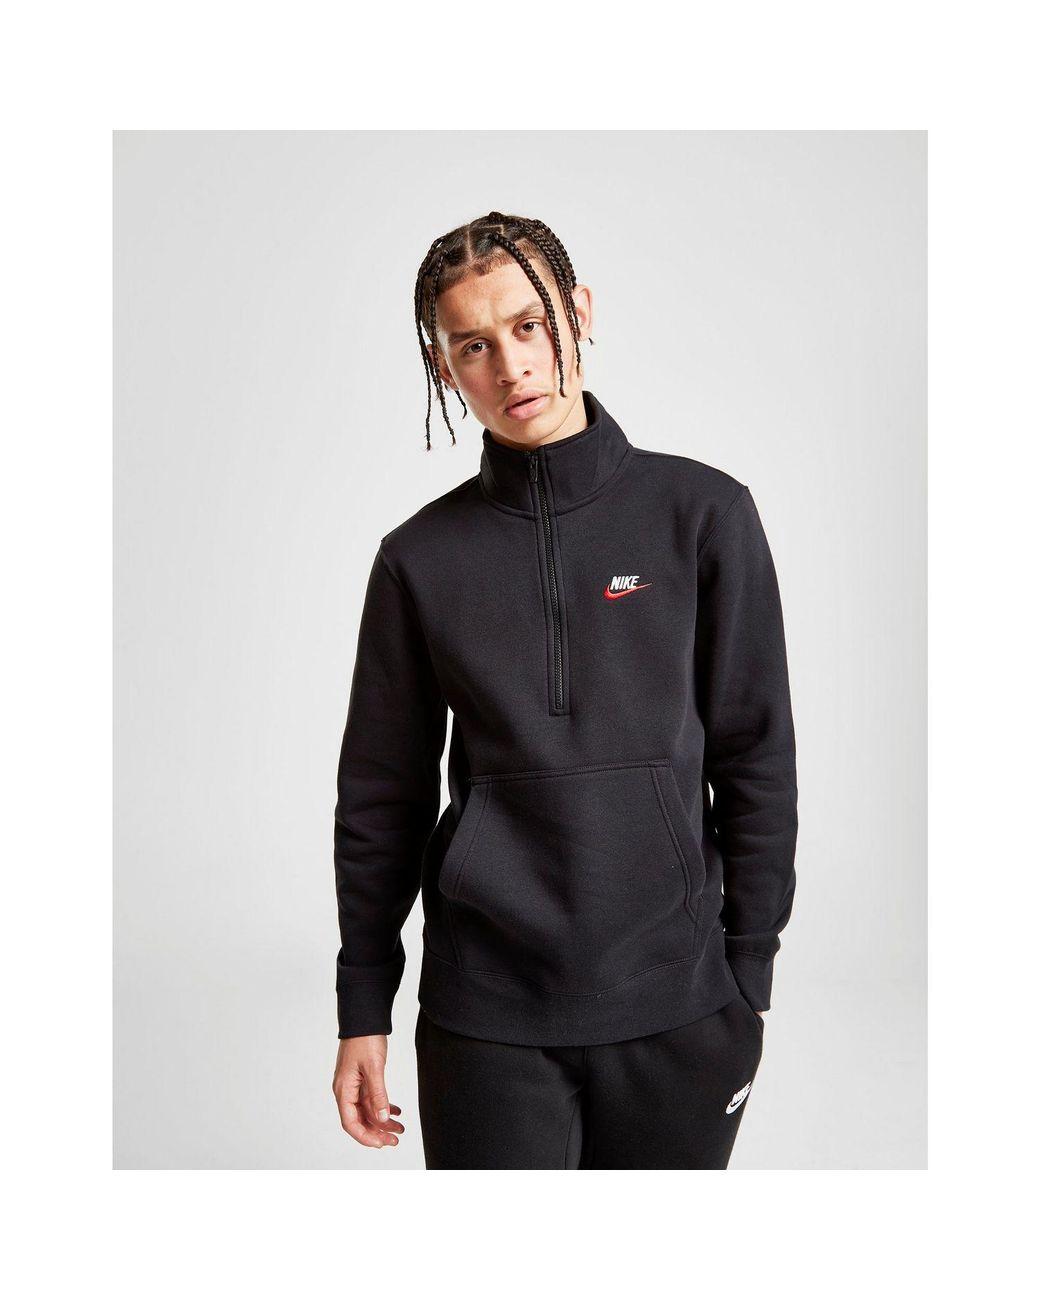 ebffa792d7d2 Nike Foundation 1 2 Zip Sweatshirt in Black for Men - Lyst